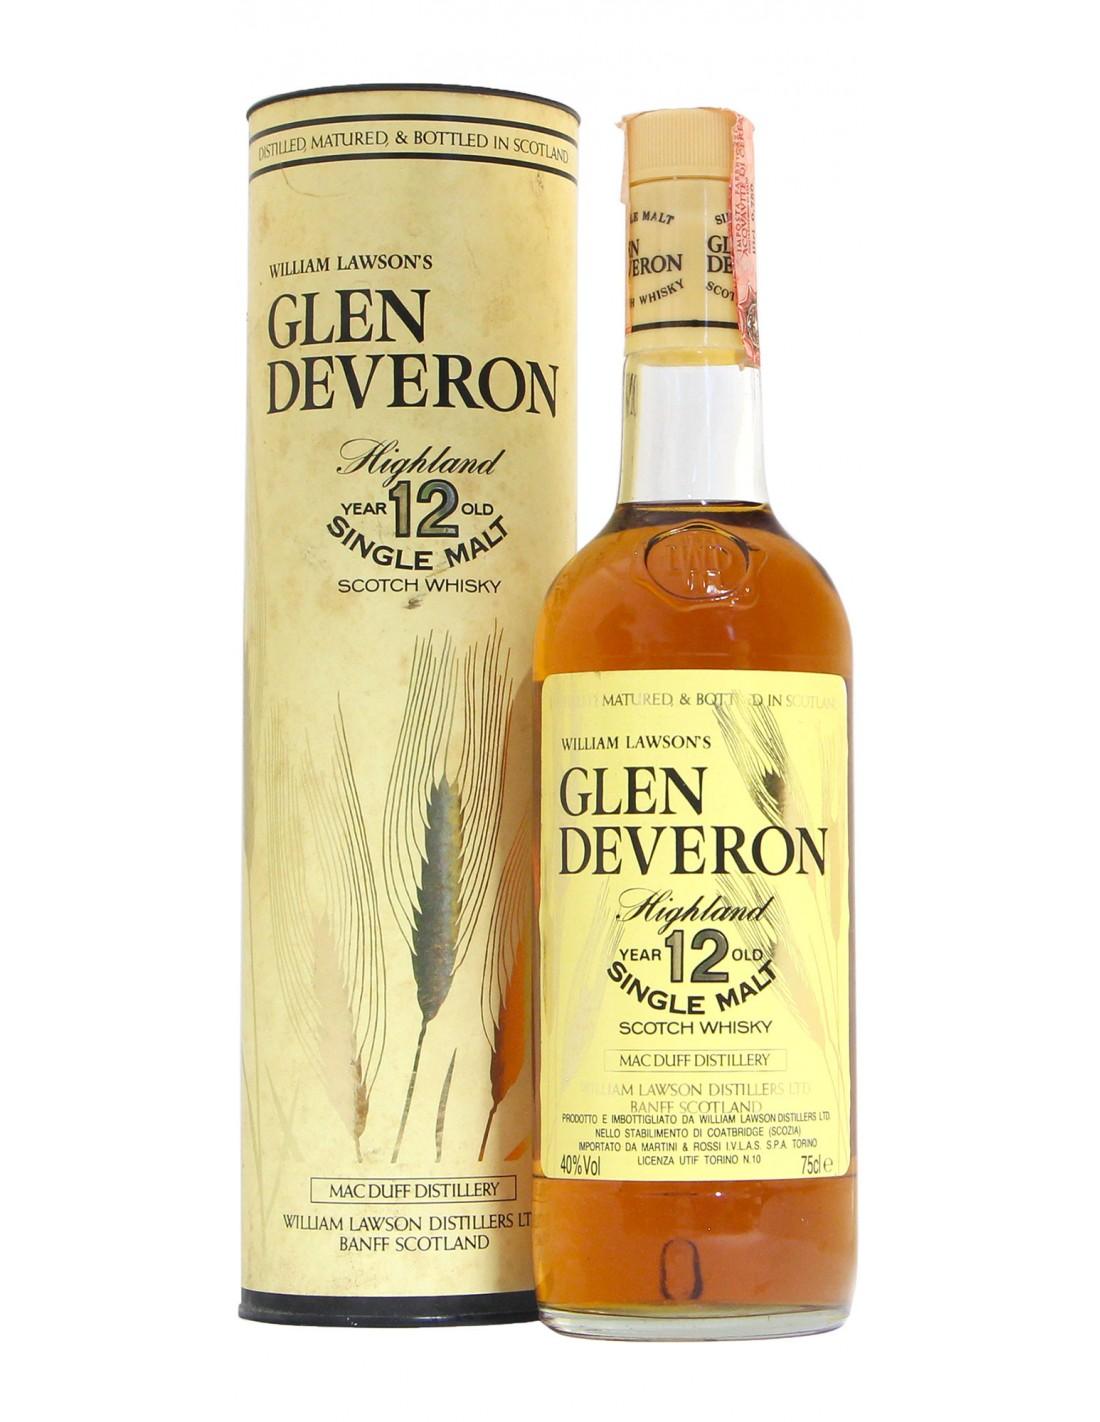 WHISKY GLEN DEVERON 12YO 75CL 40VOL NV WILLIAM LAWSON'S Grandi Bottiglie